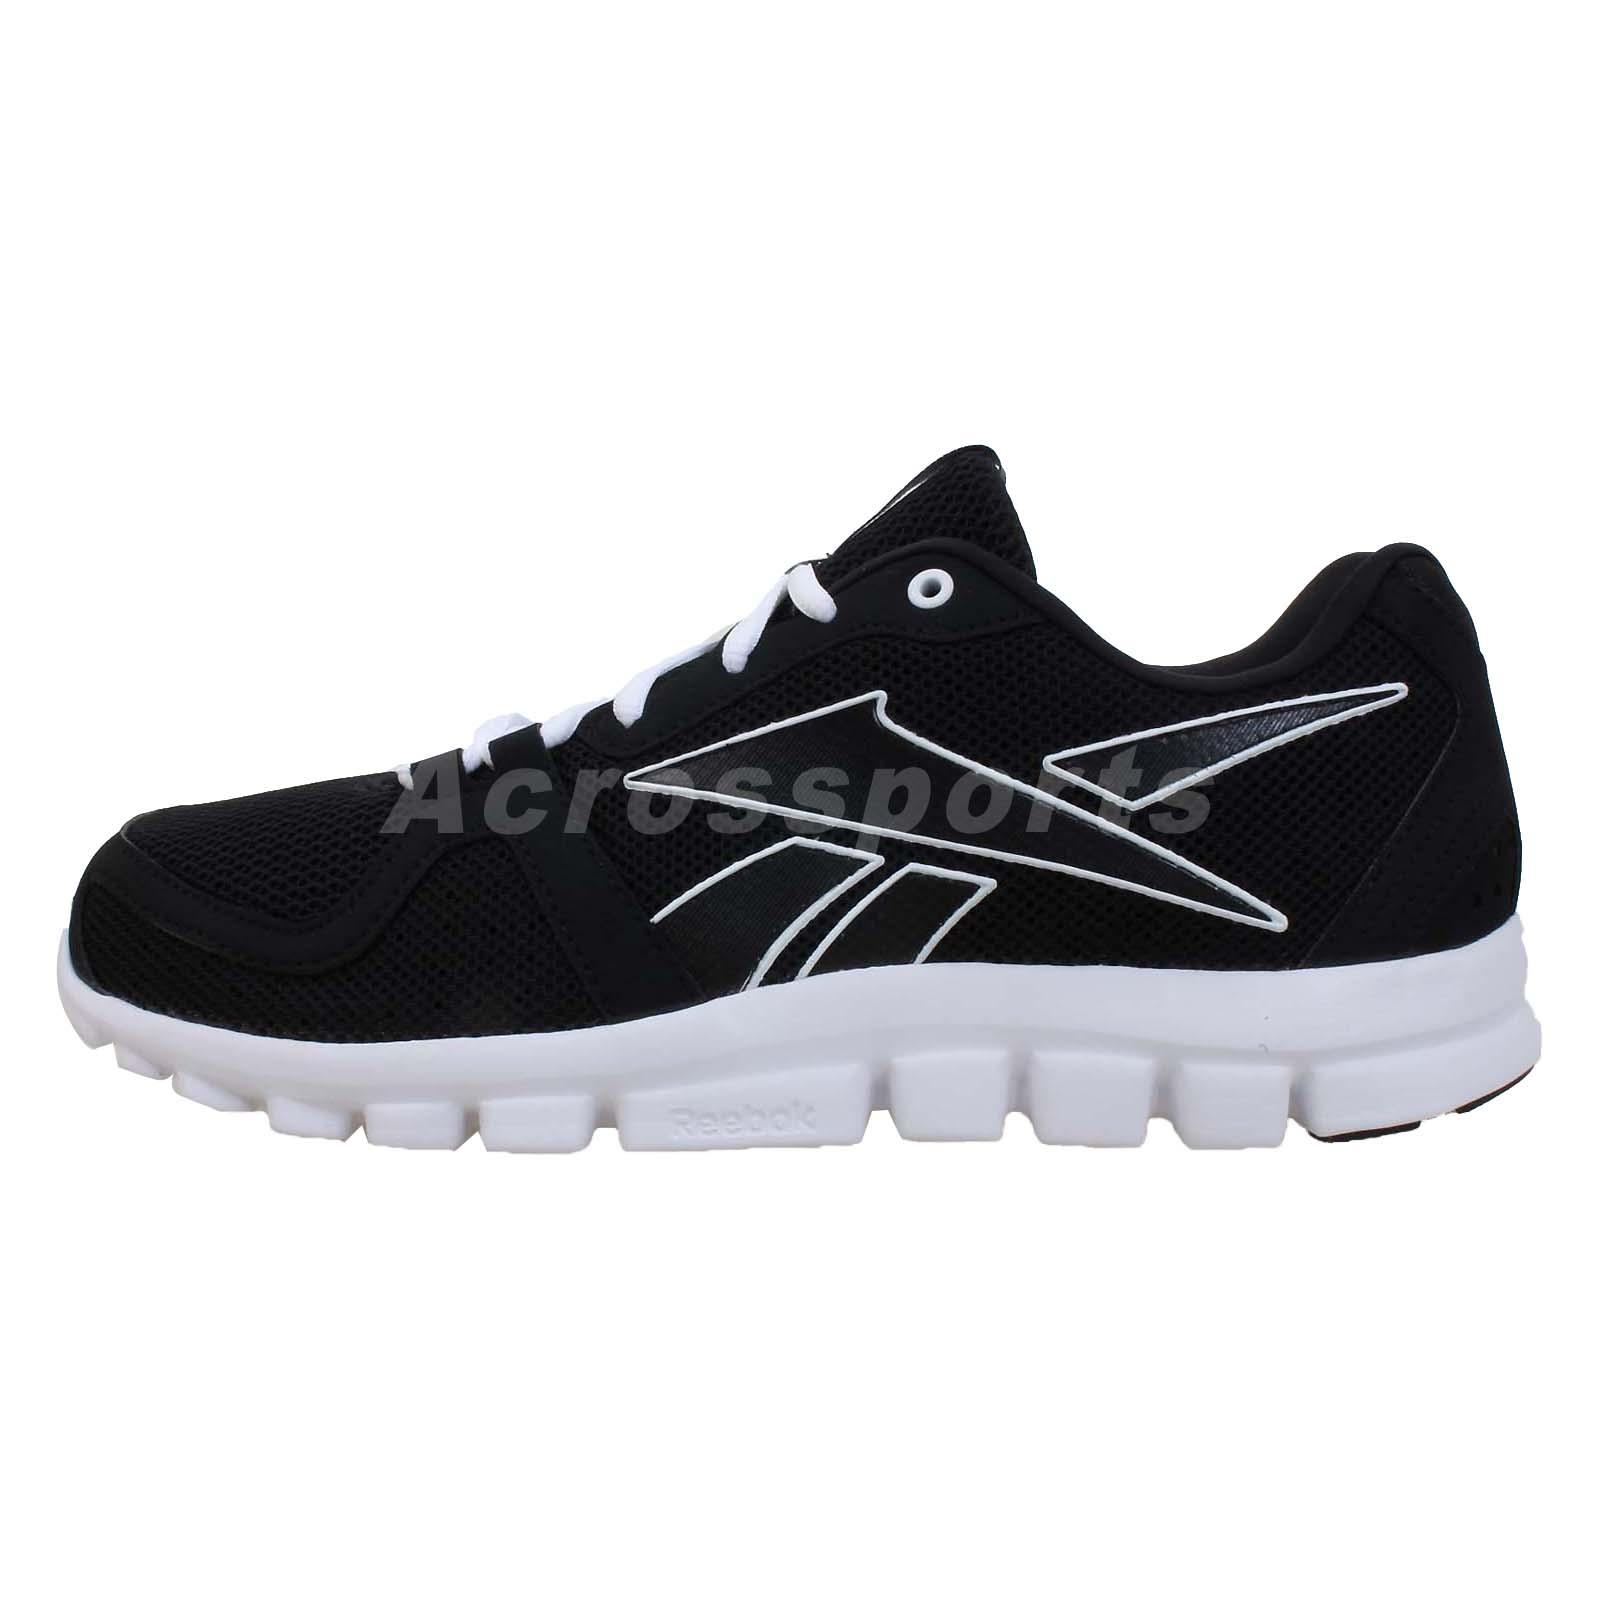 Reebok Running Shoes 2013 Reebok Yourflex Run 4....